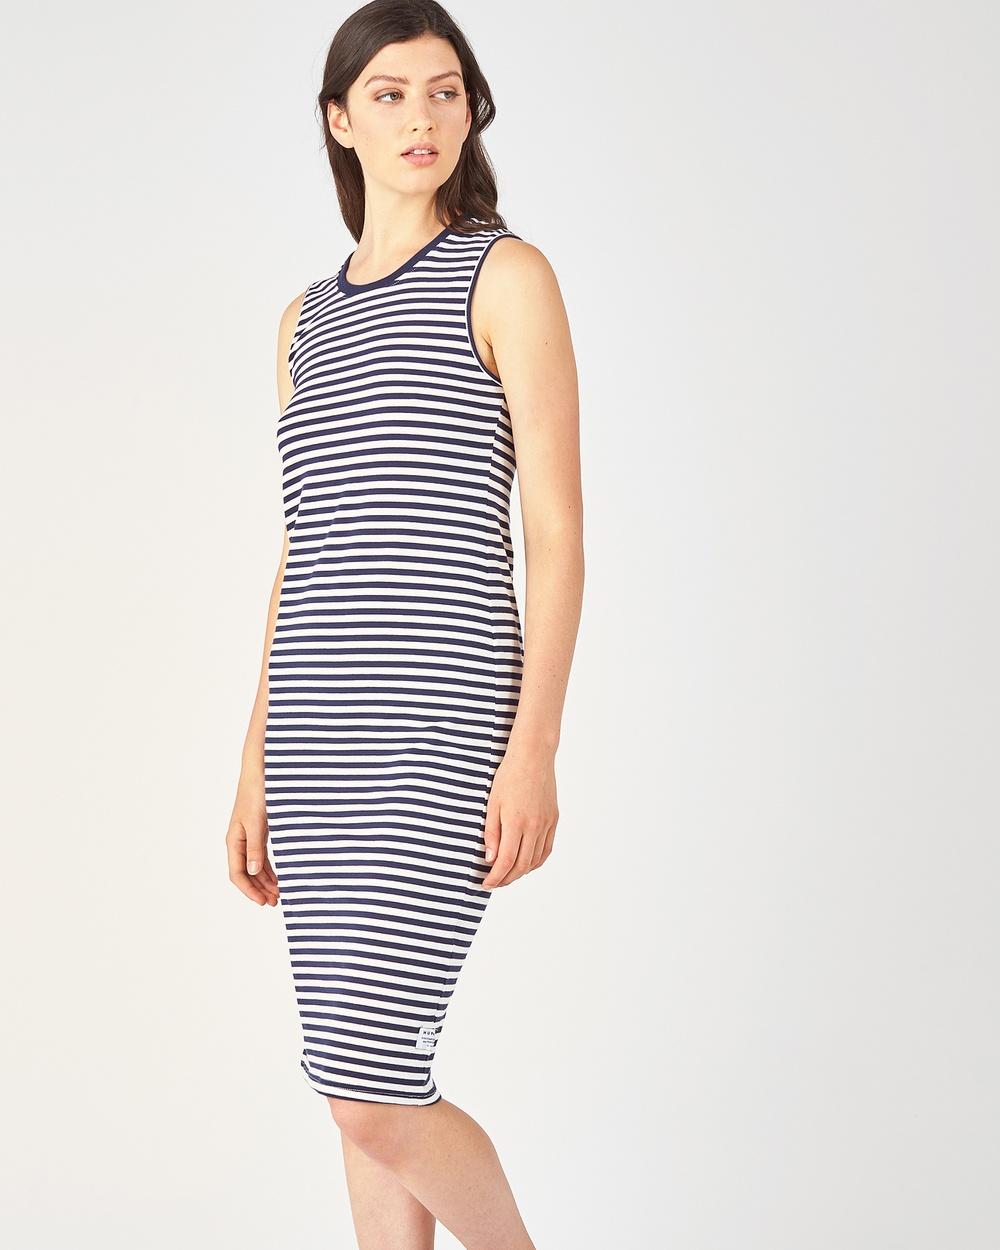 Huffer Stella Dress Dresses NAVY-CREAM Stella Dress